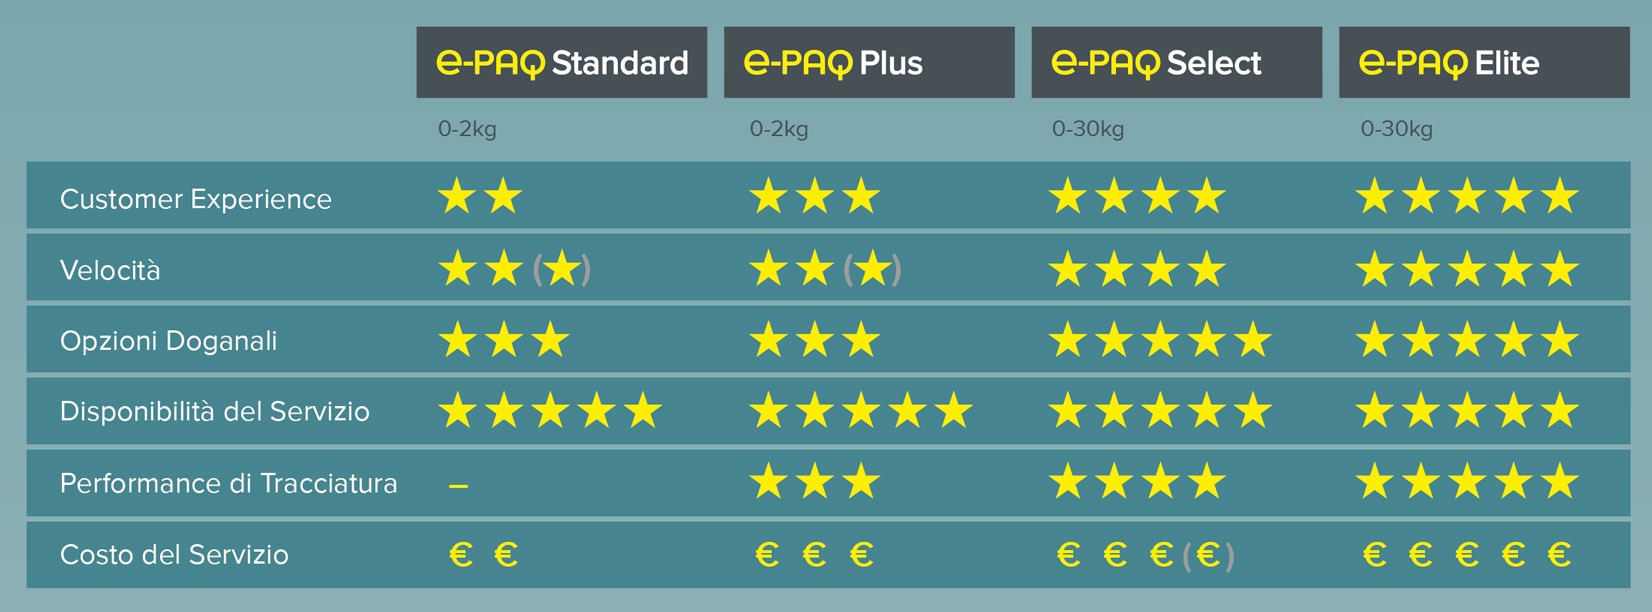 e-PAQ Table IT